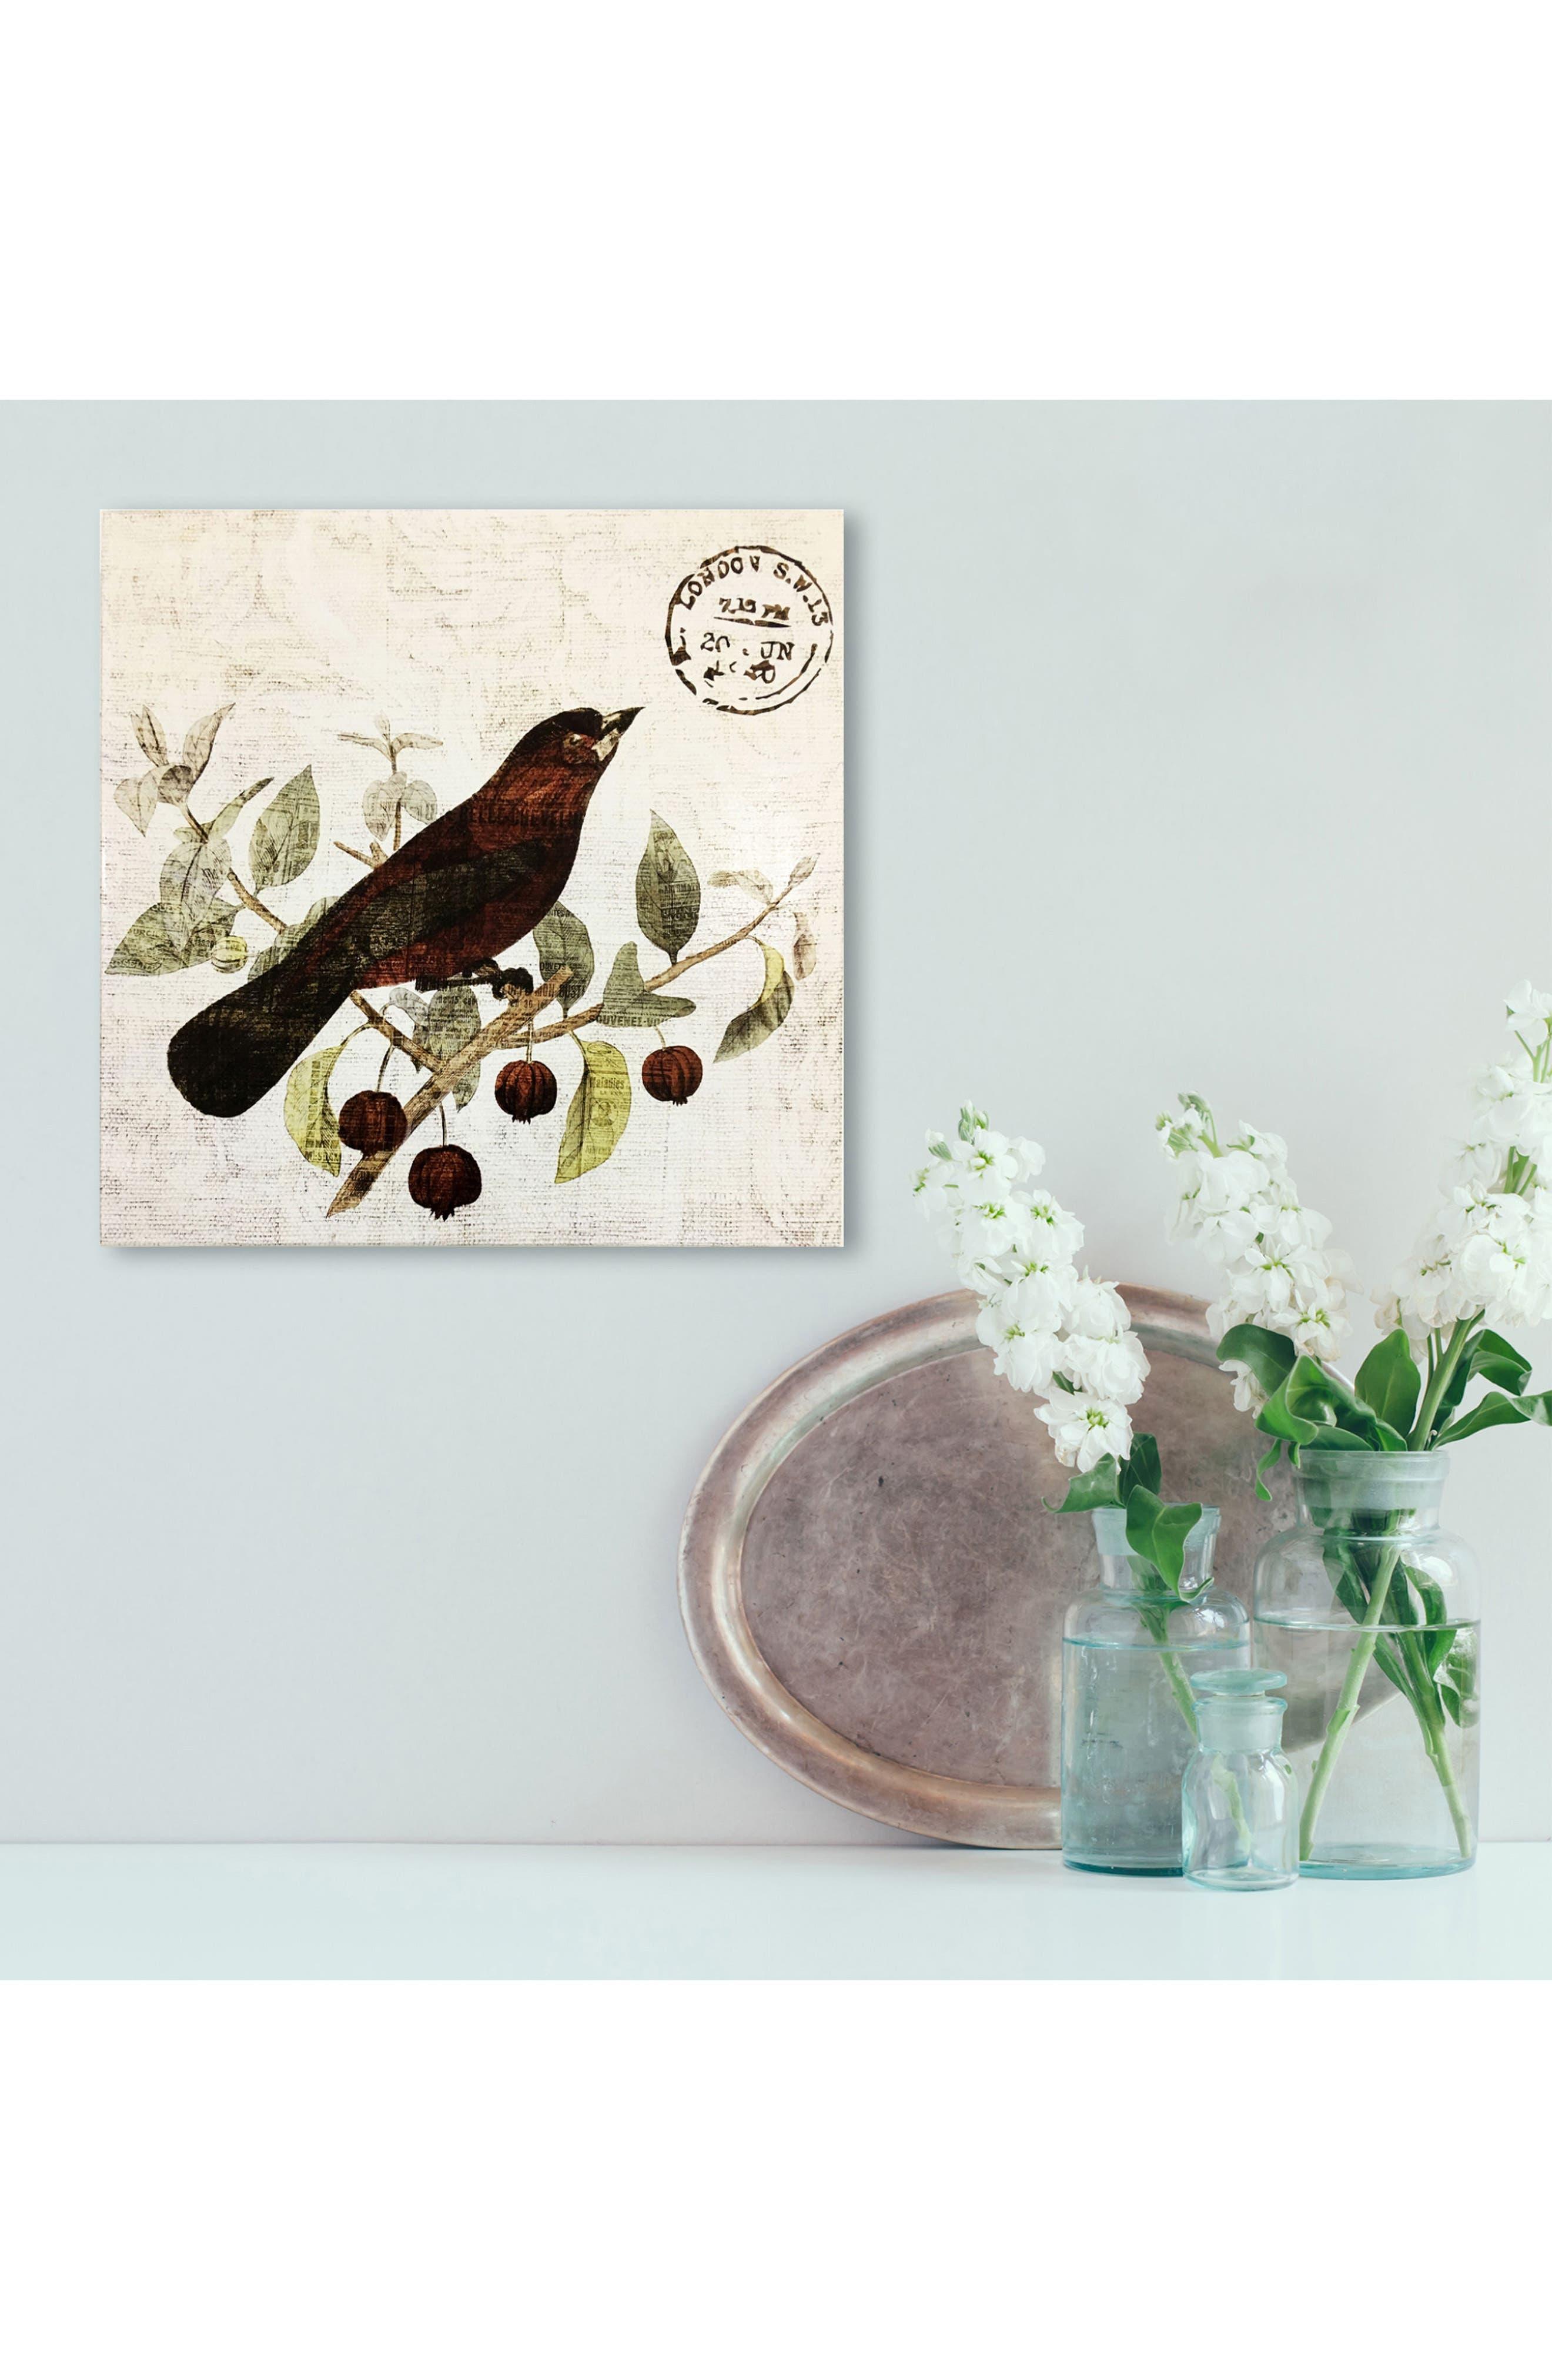 Wynwood Bird in the Tree II Wall Art,                             Alternate thumbnail 2, color,                             250